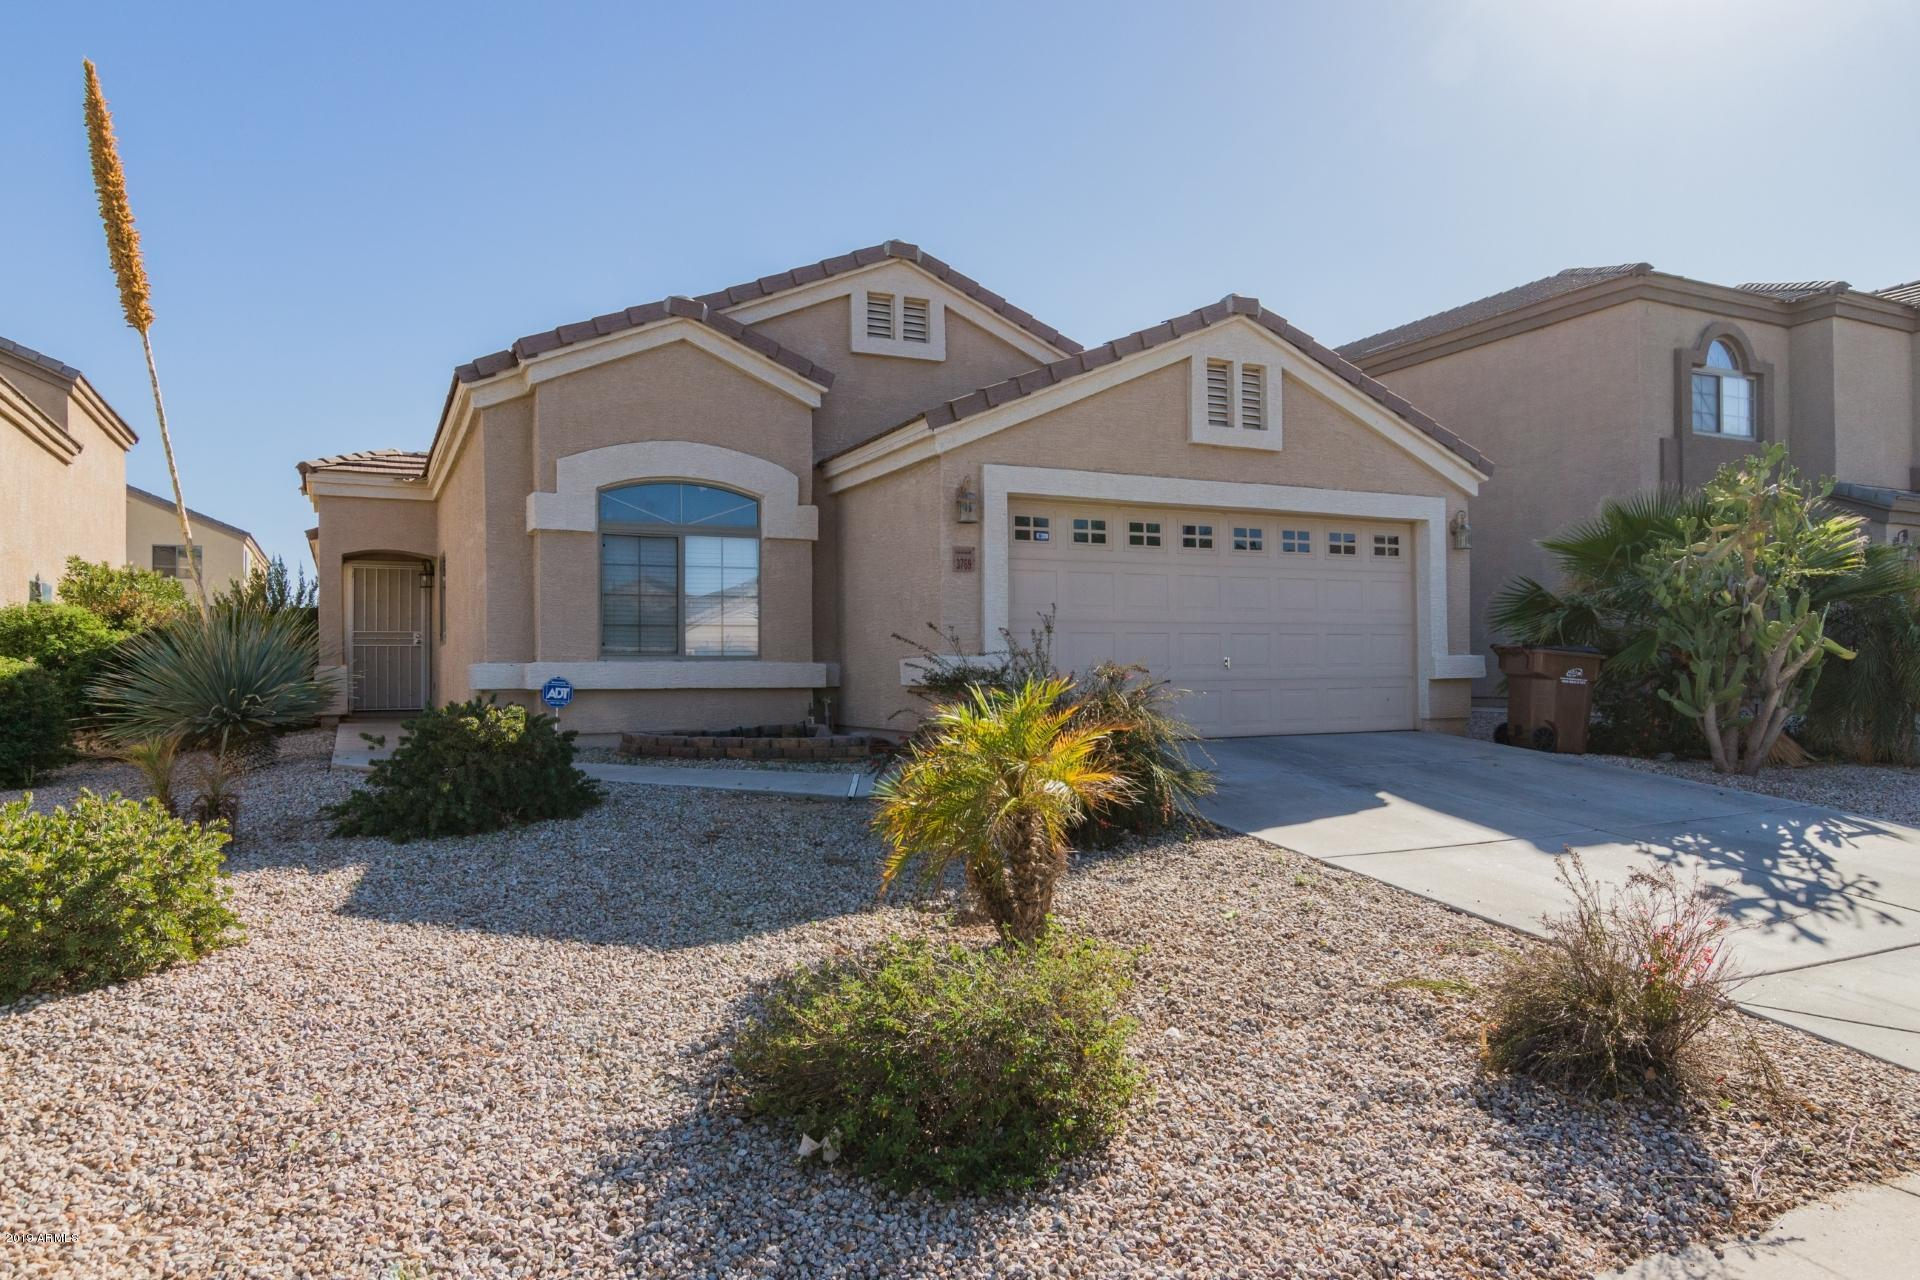 Photo of 3769 W DANCER Lane, Queen Creek, AZ 85142